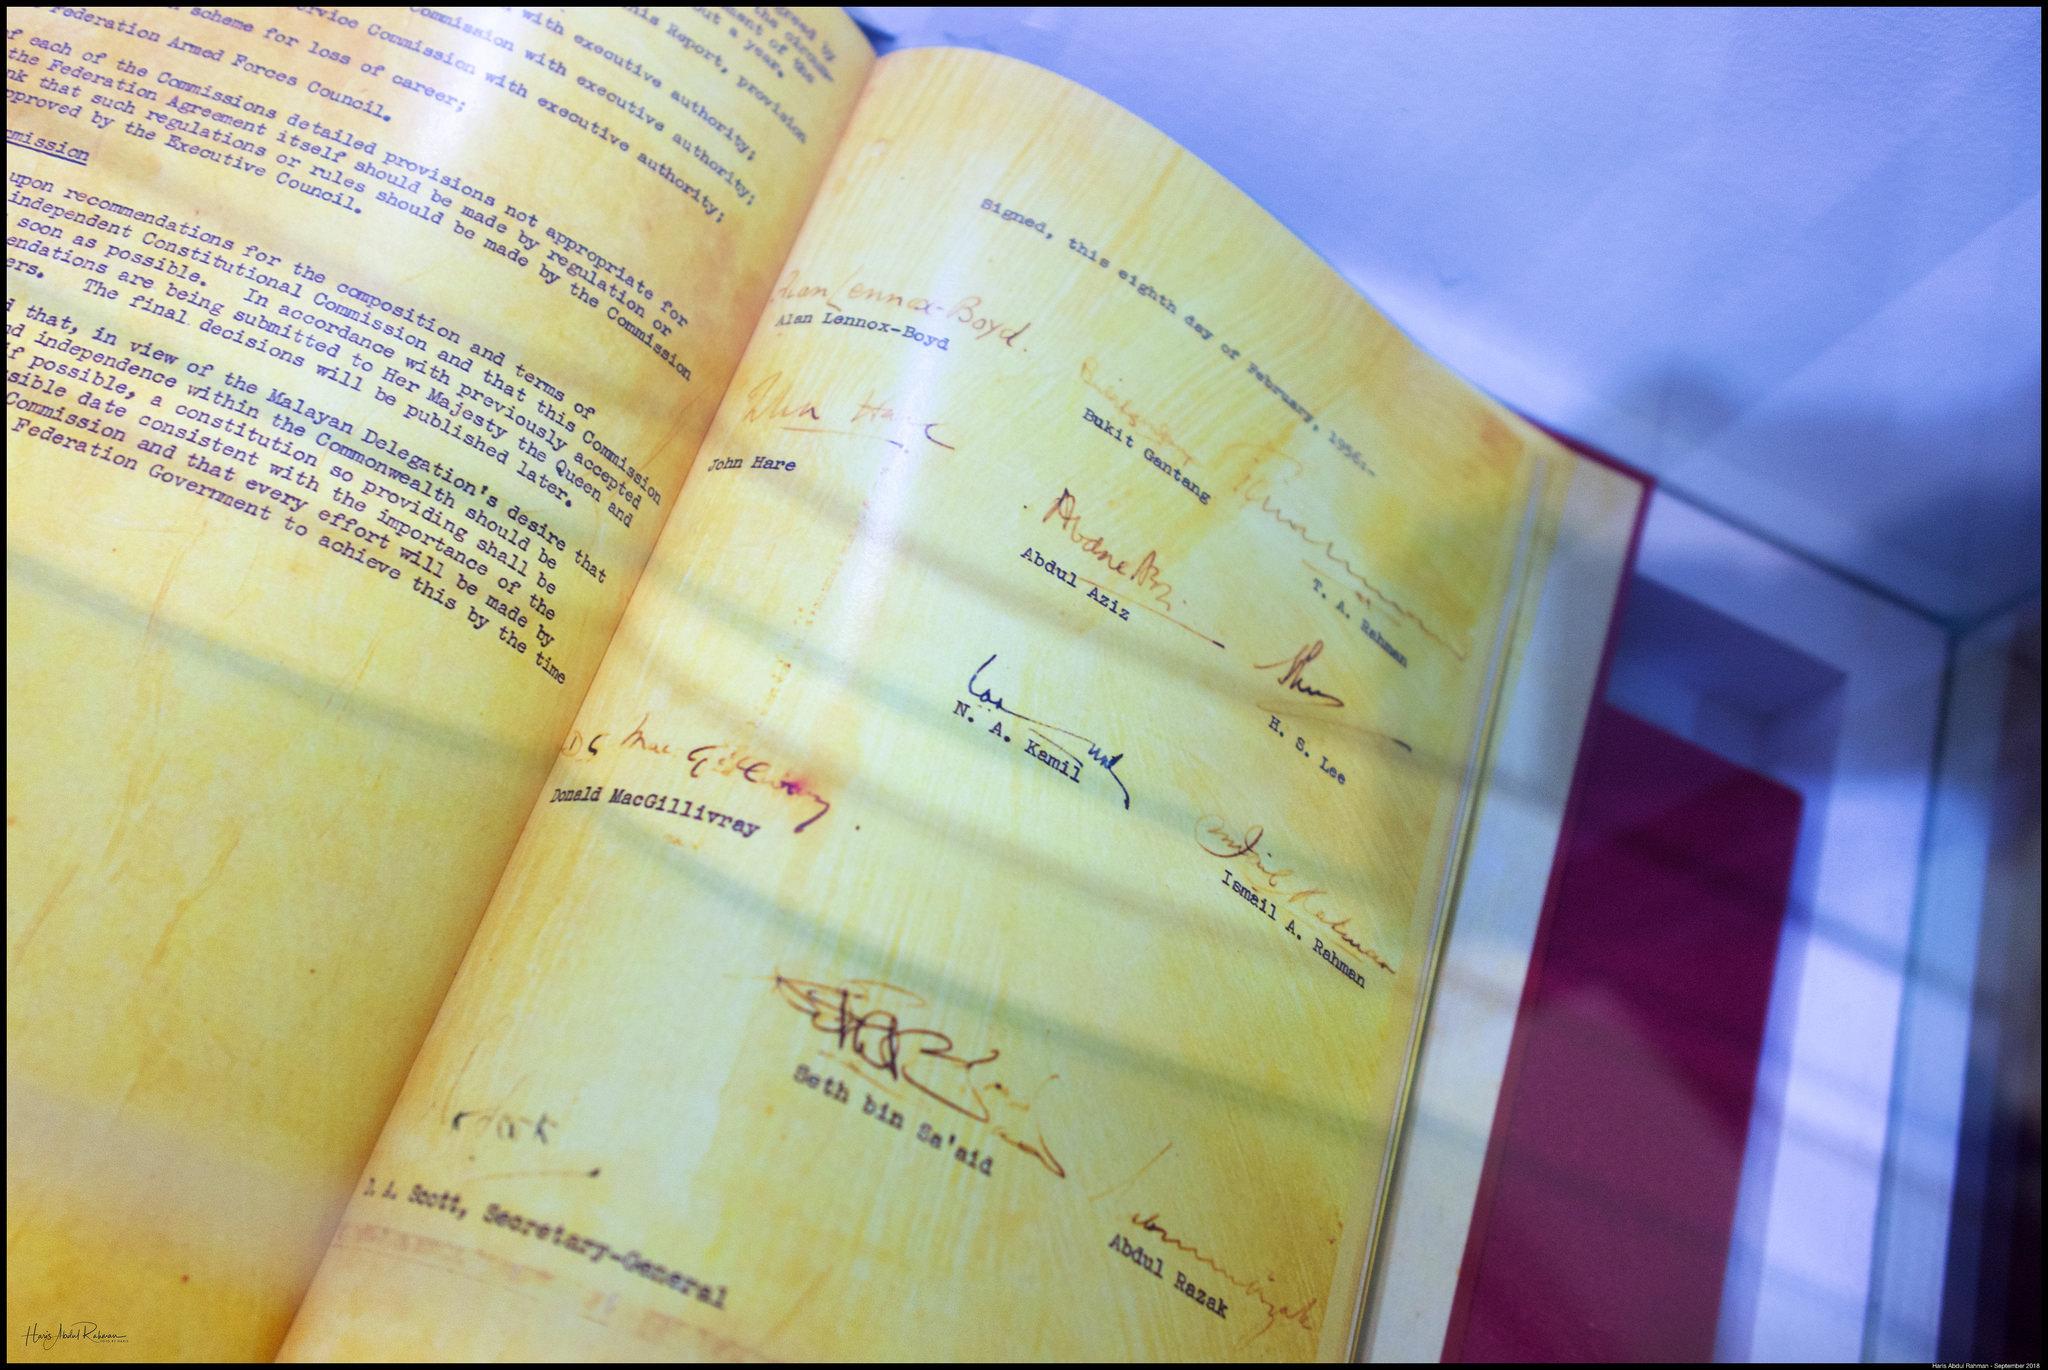 Signatures for Declaration of Merdeka